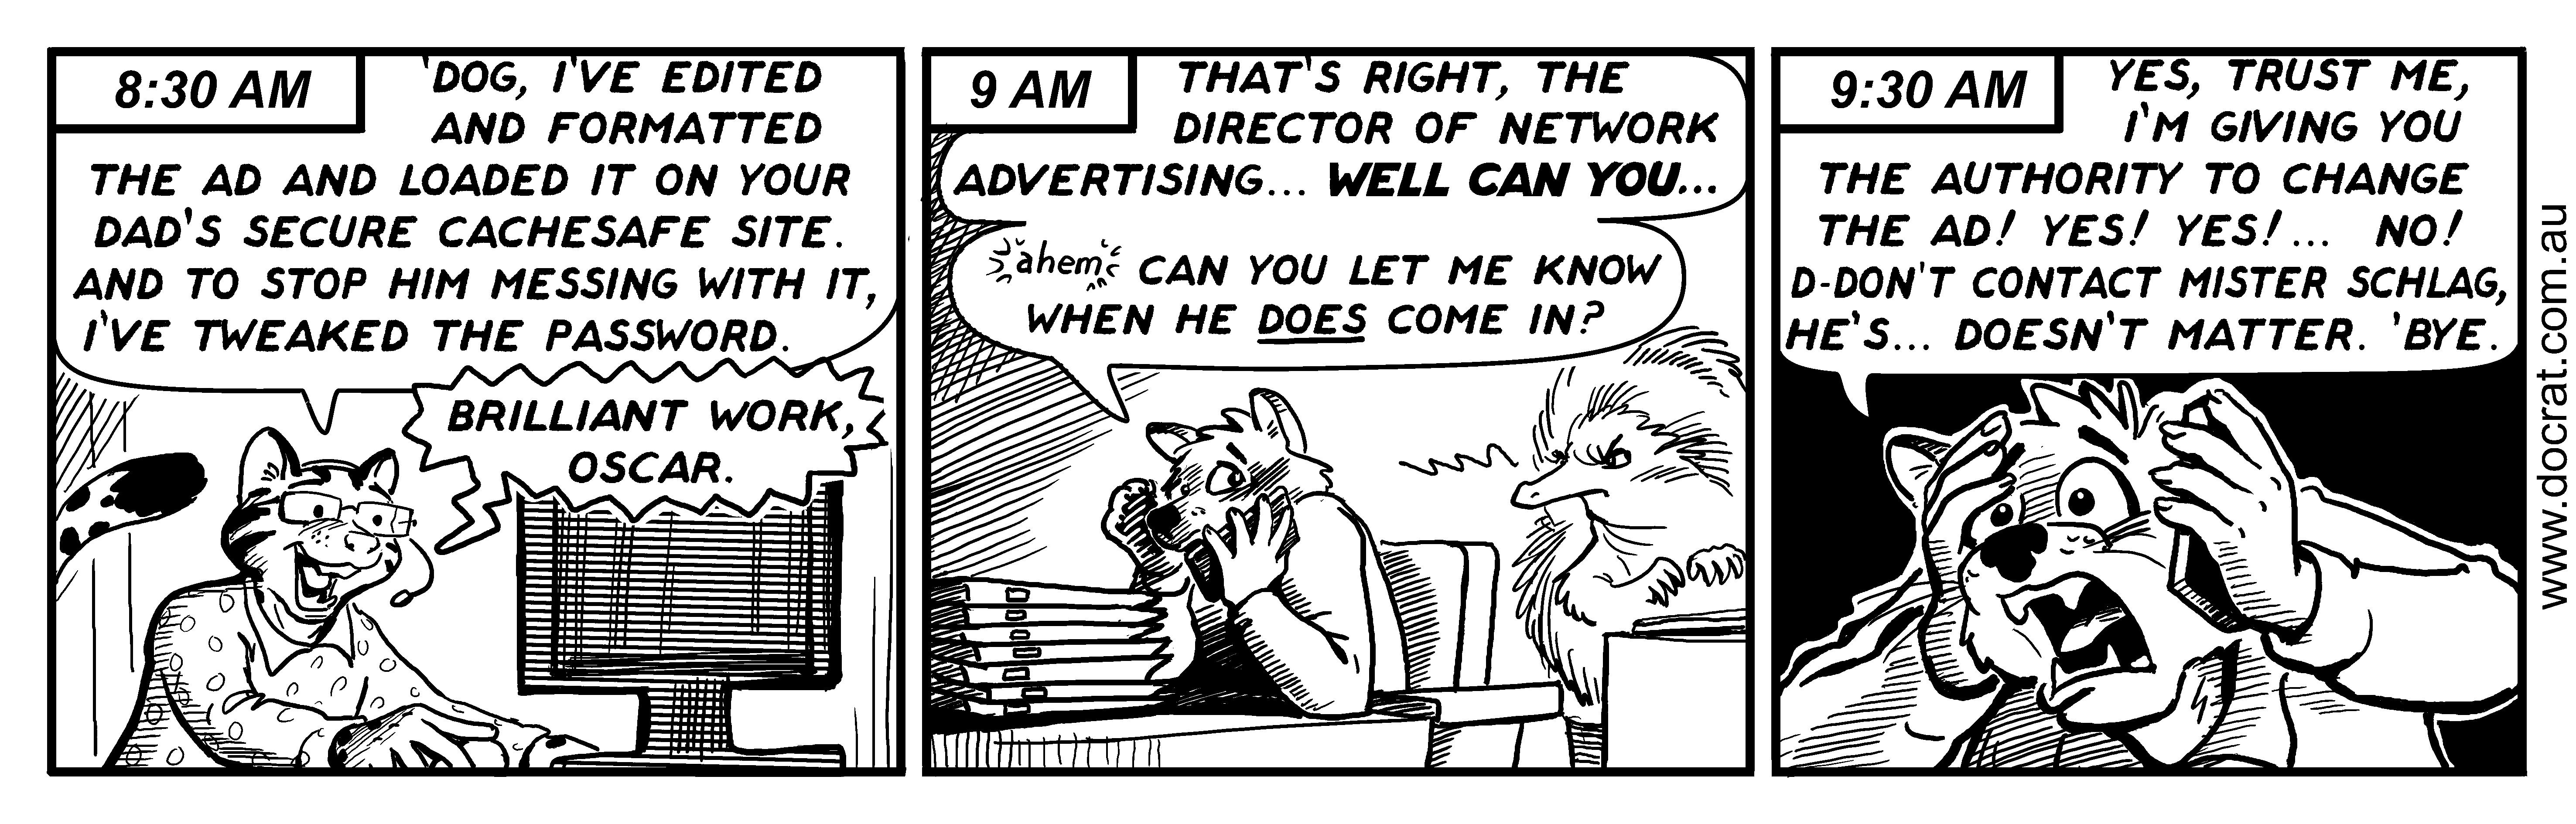 20180522